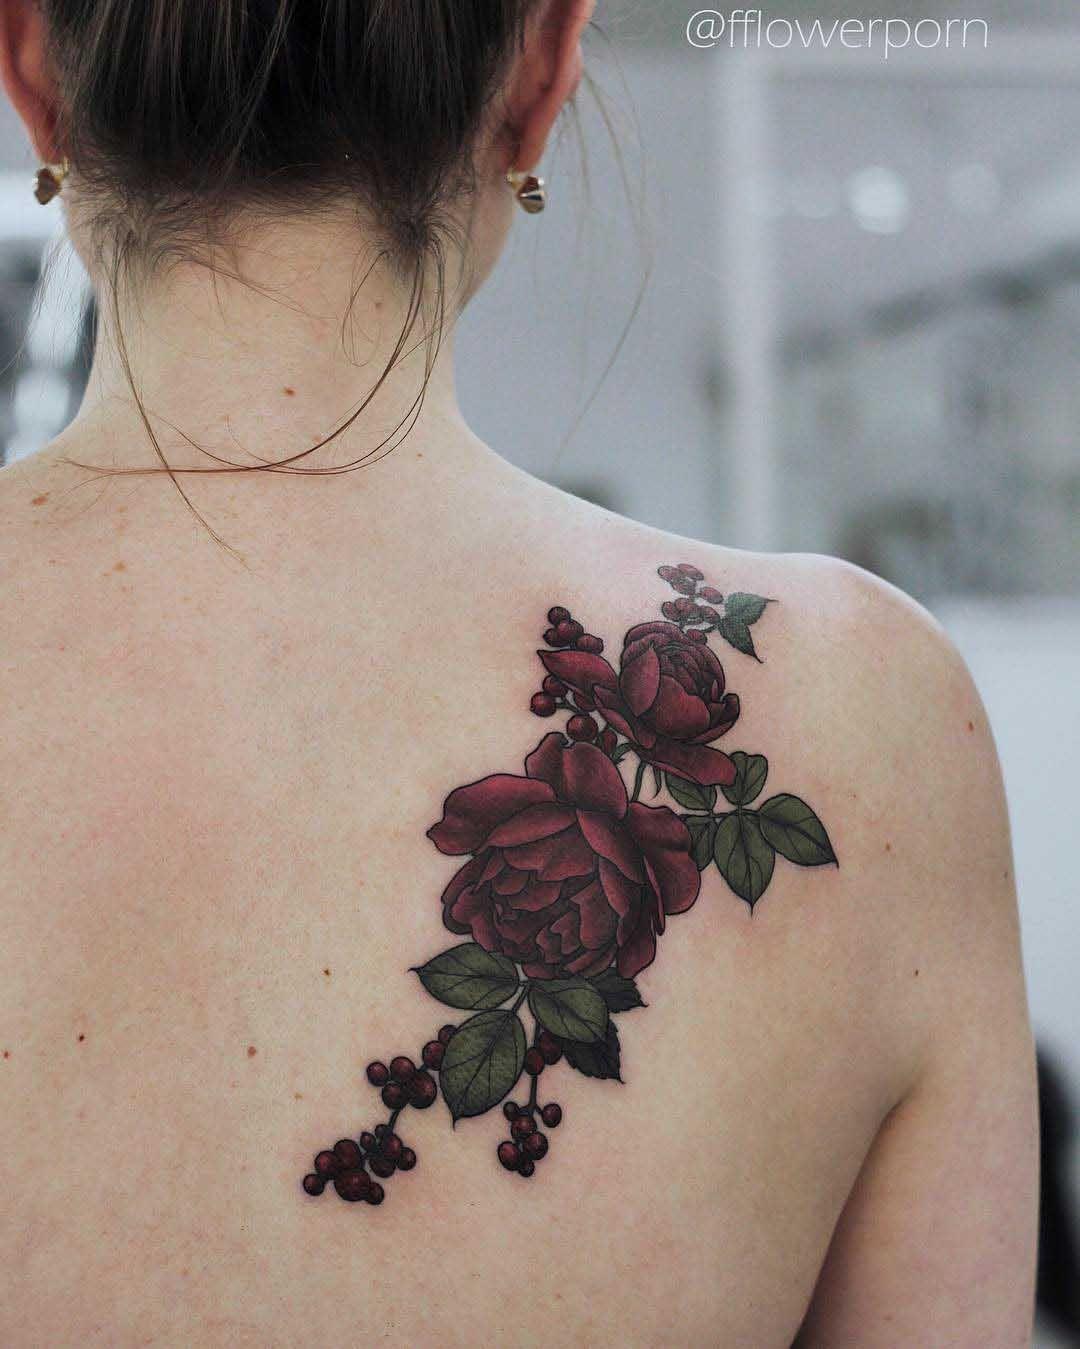 Rose Tattoo On Back Shoulder Best Tattoo Ideas Gallery Tatuajes De Rosas Rojas Tatuajes Cuello Tatuajes De Flor En El Hombro